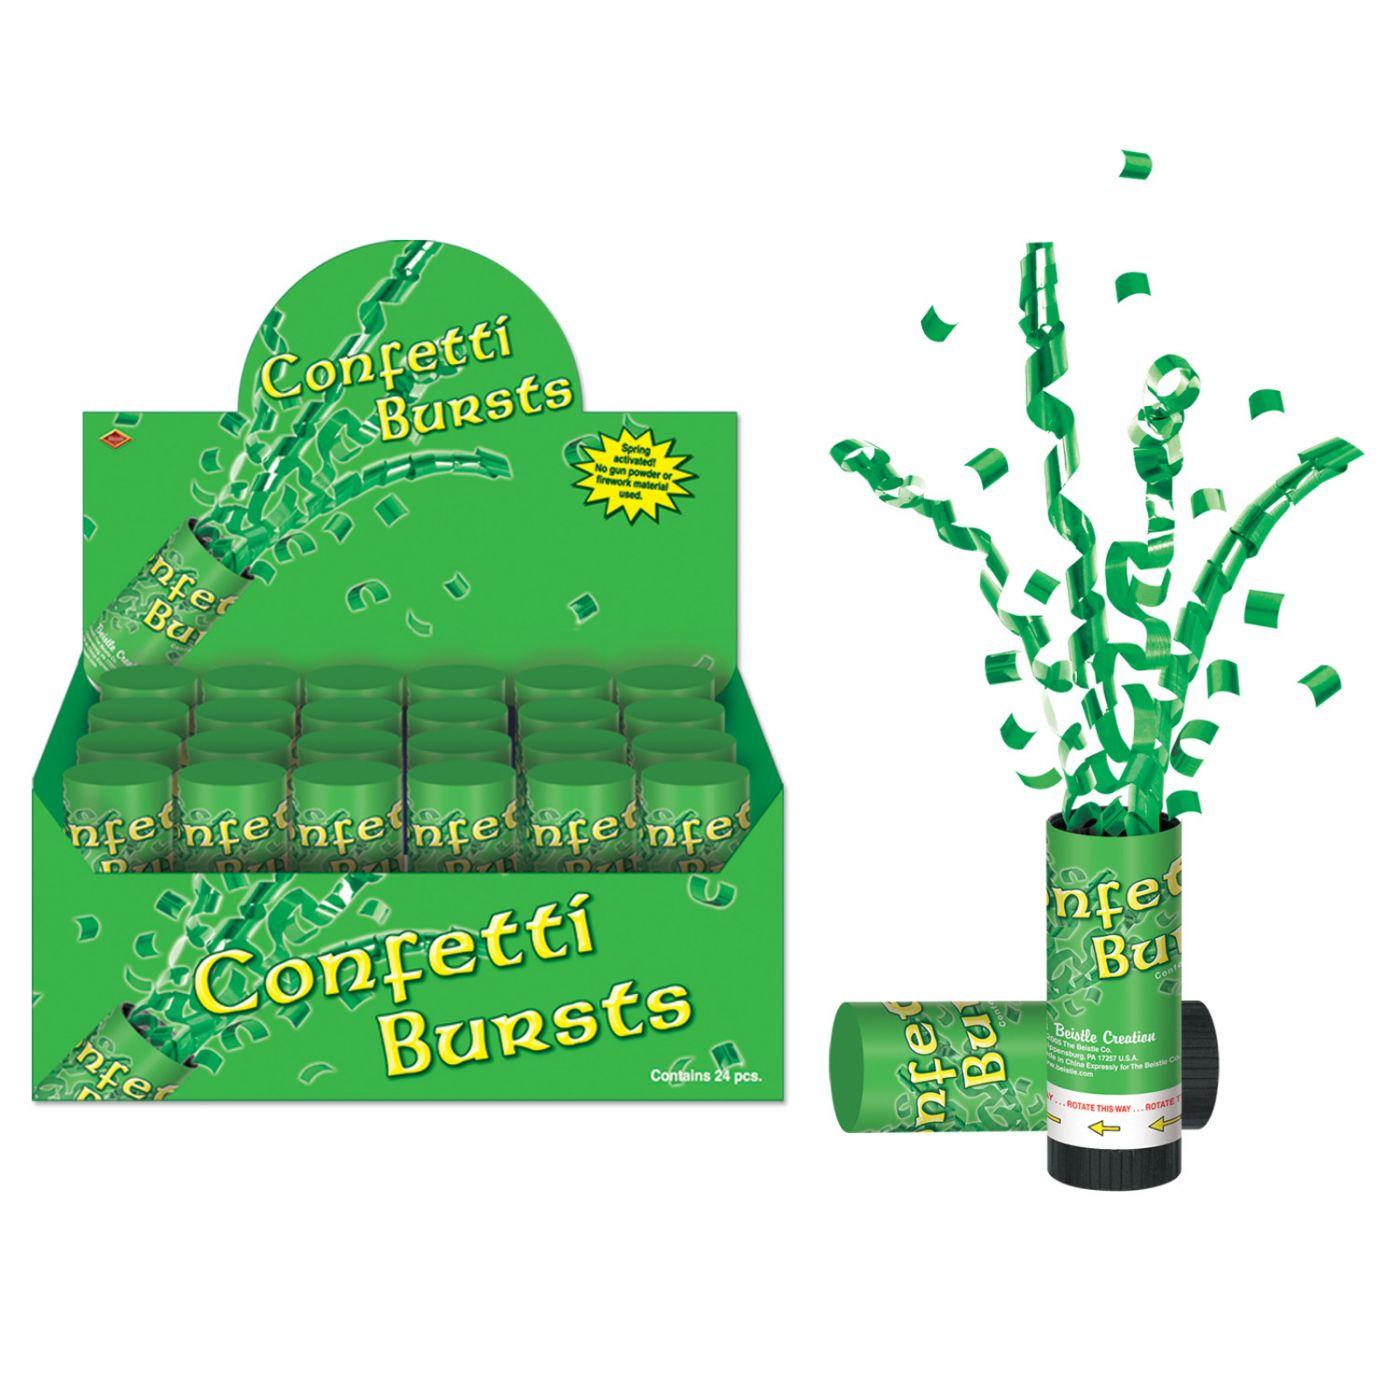 St Patrick's Day Confetti Bursts (24) image